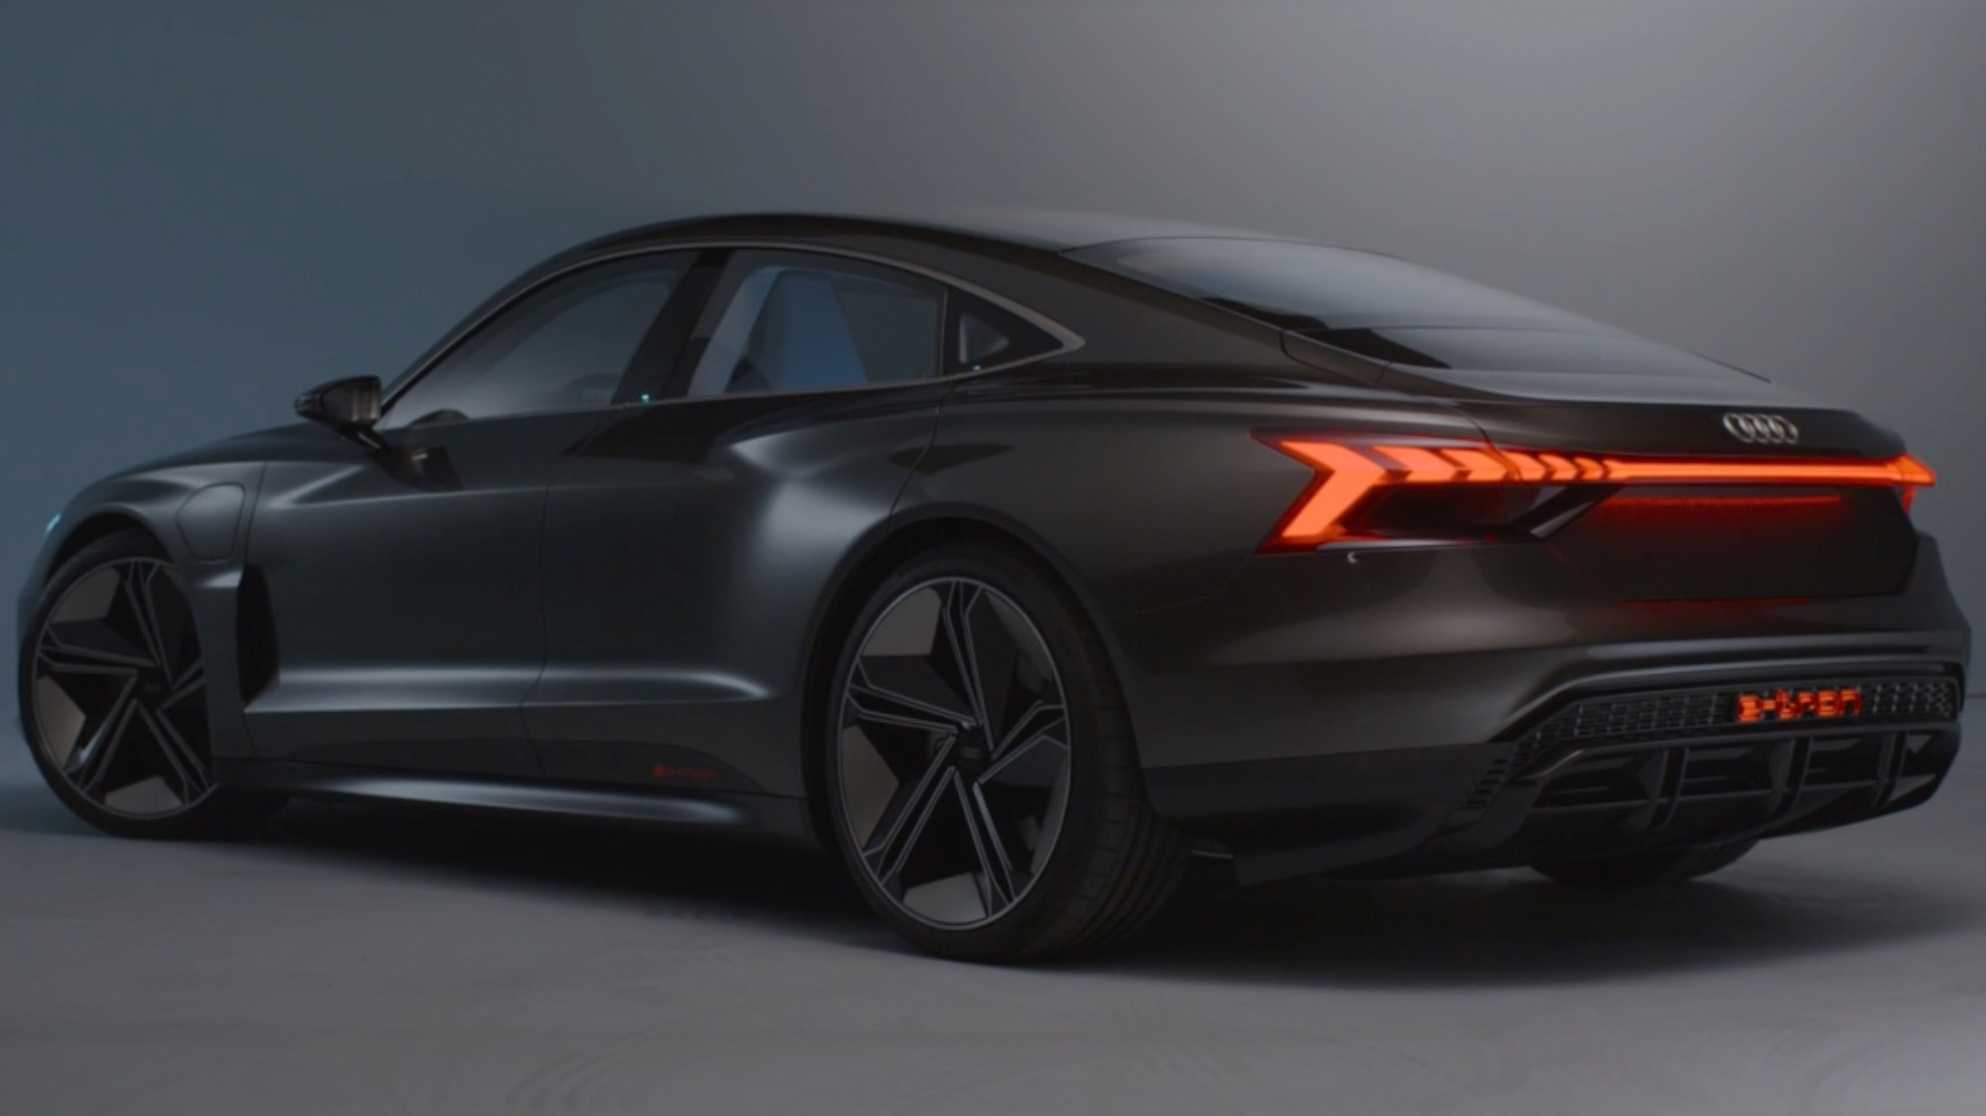 Audi investiert 14 Milliarden Euro in Elektromobilität und autonomes Fahren